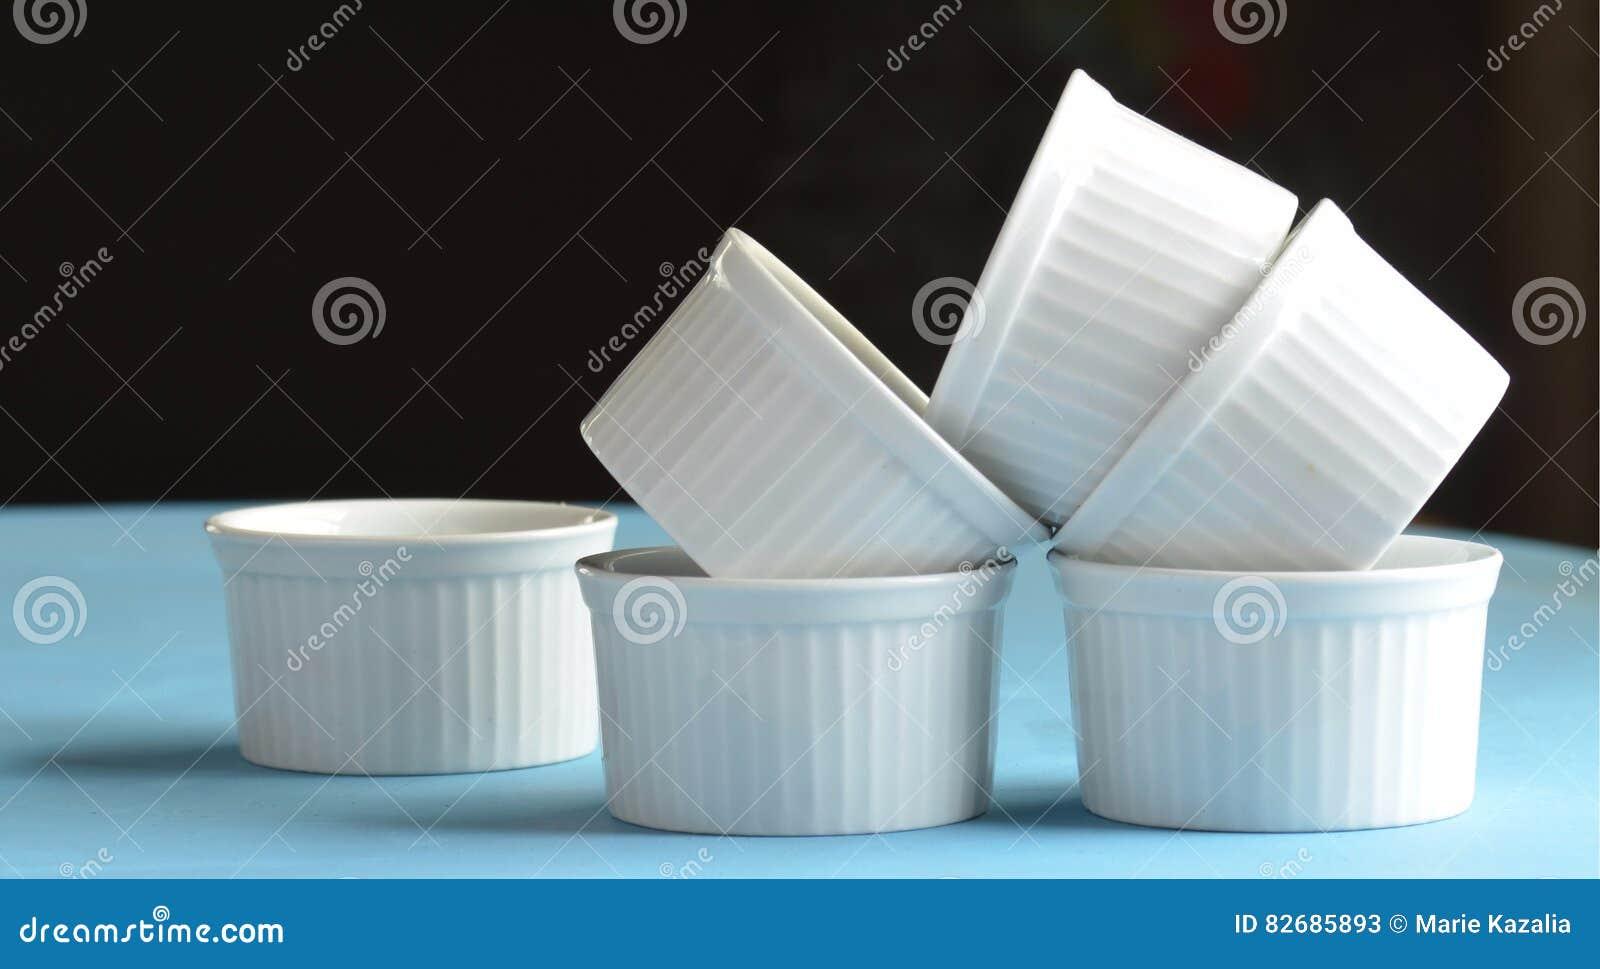 Mini platos de la hornada del ramekin blanco de la porcelana